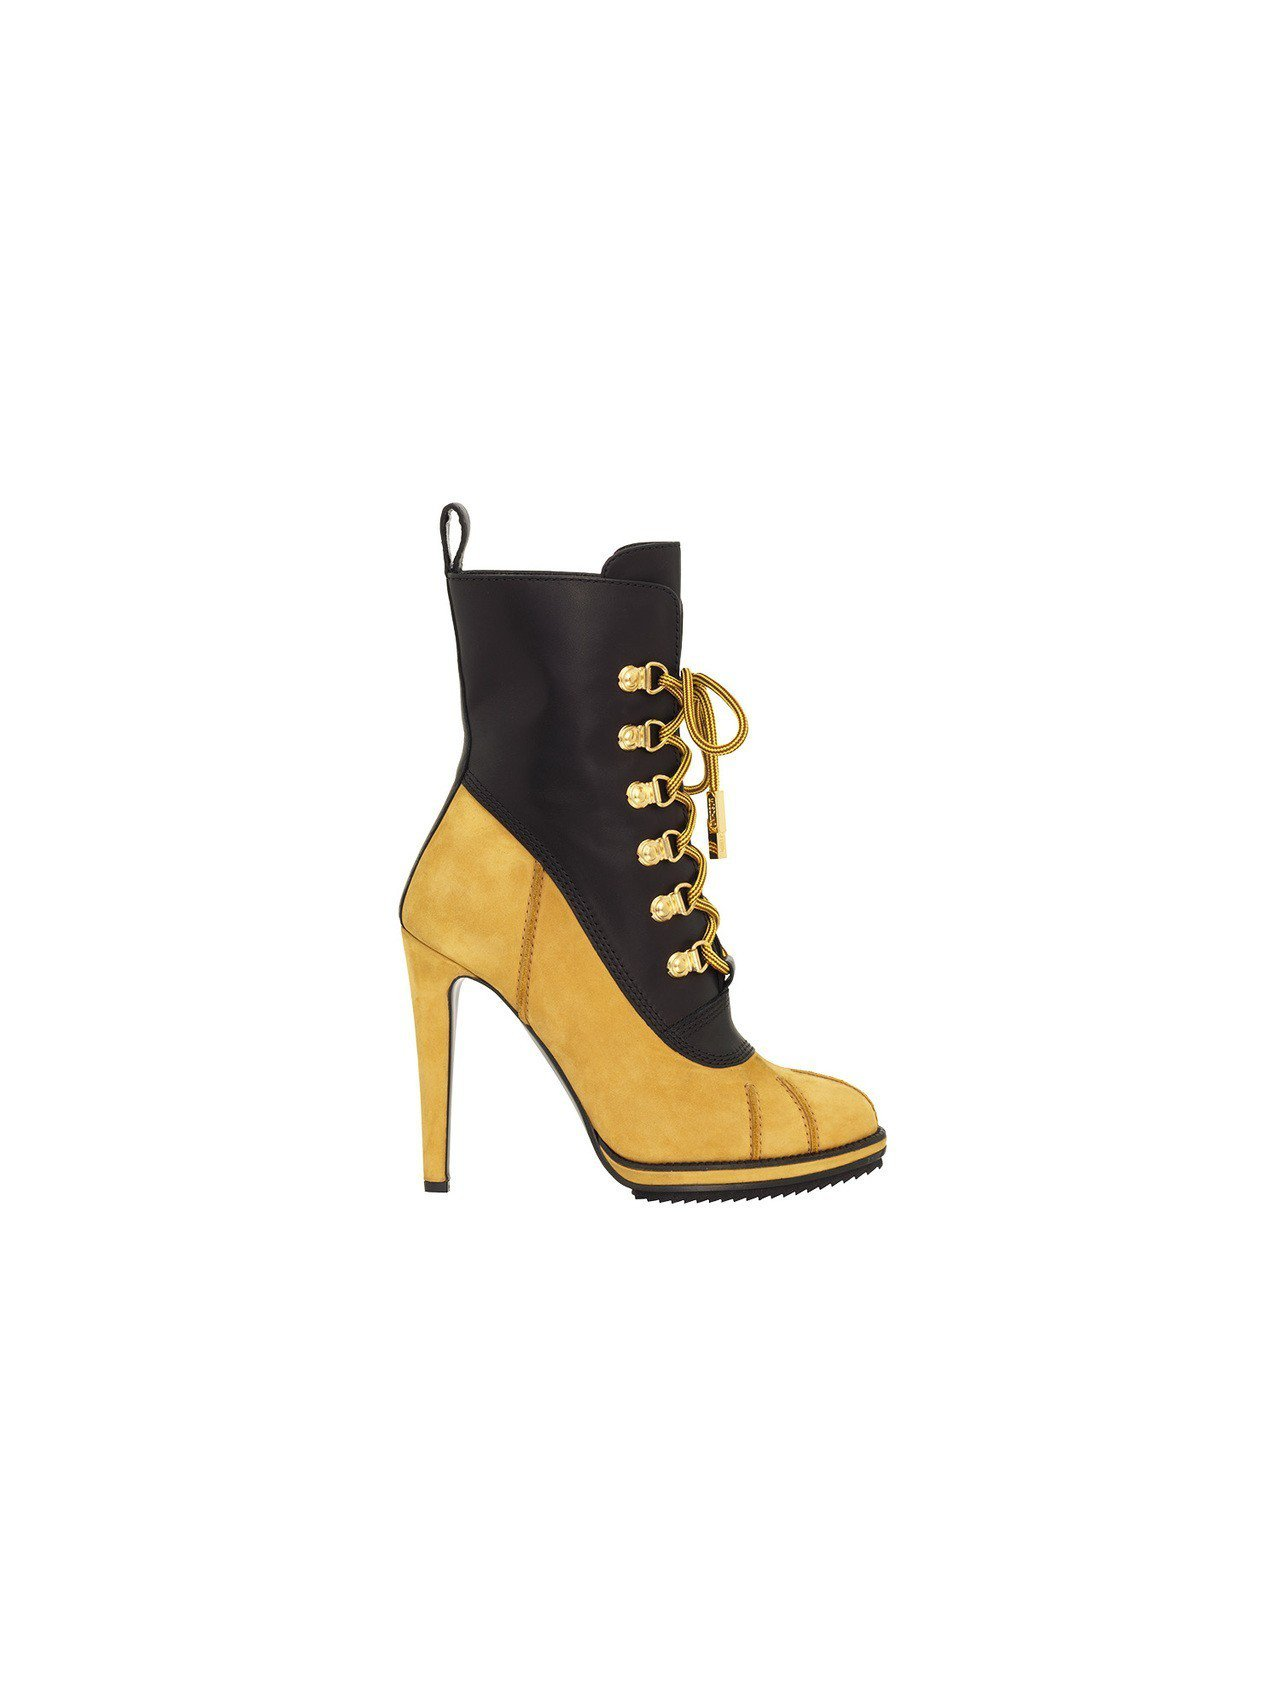 Moschino[TV] H&M系列女裝高跟鞋,7,999元。圖/H&M提供